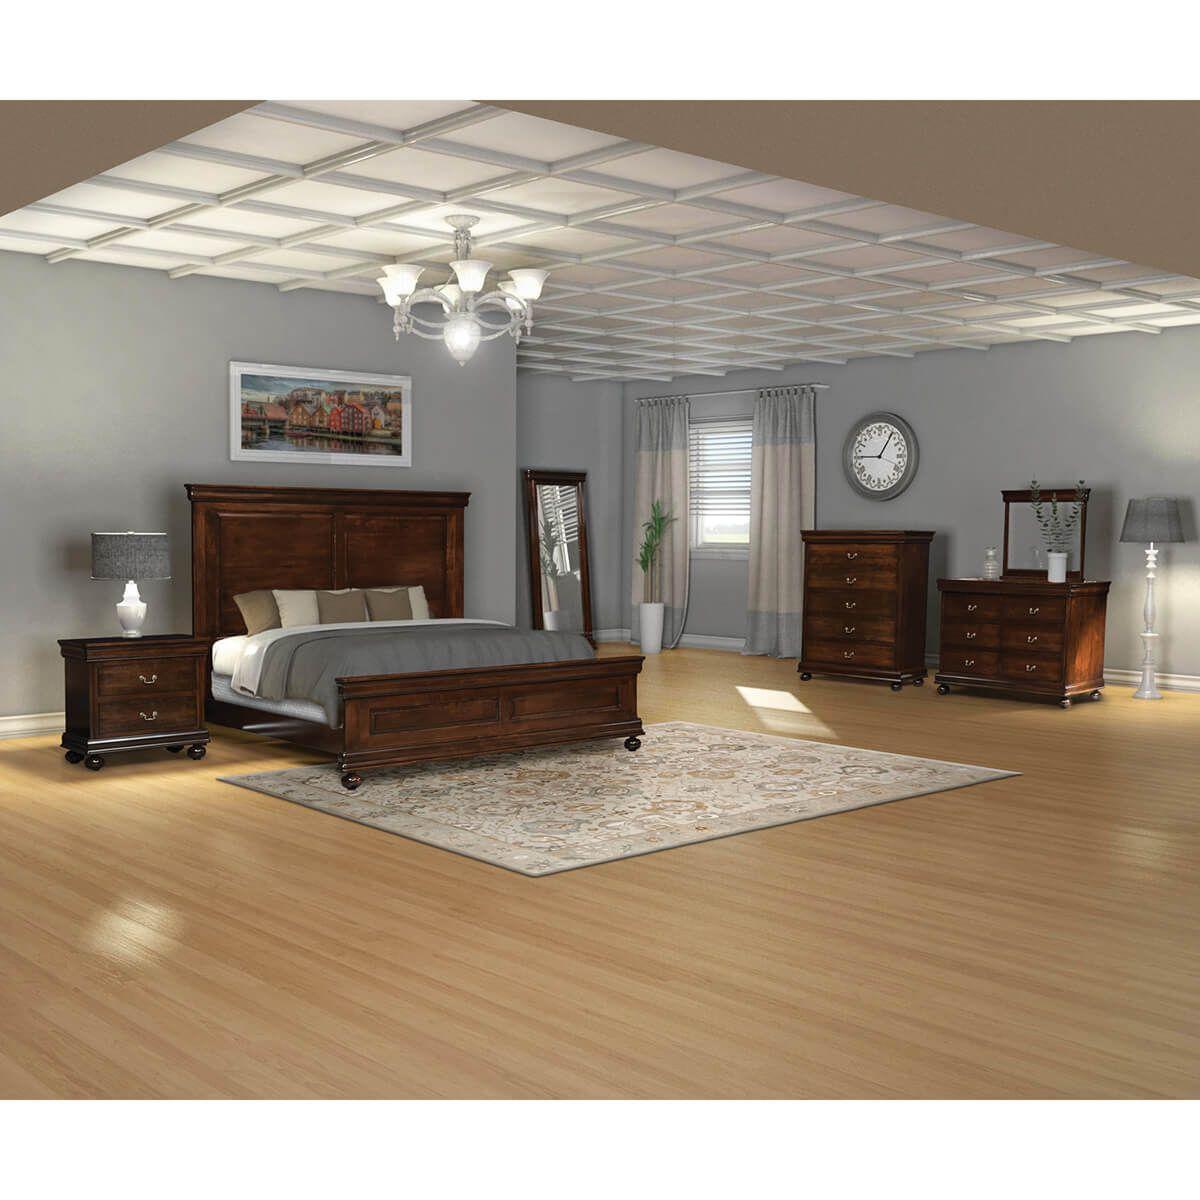 Baystorm Bedroom Collection Bedroom collection, Bedroom